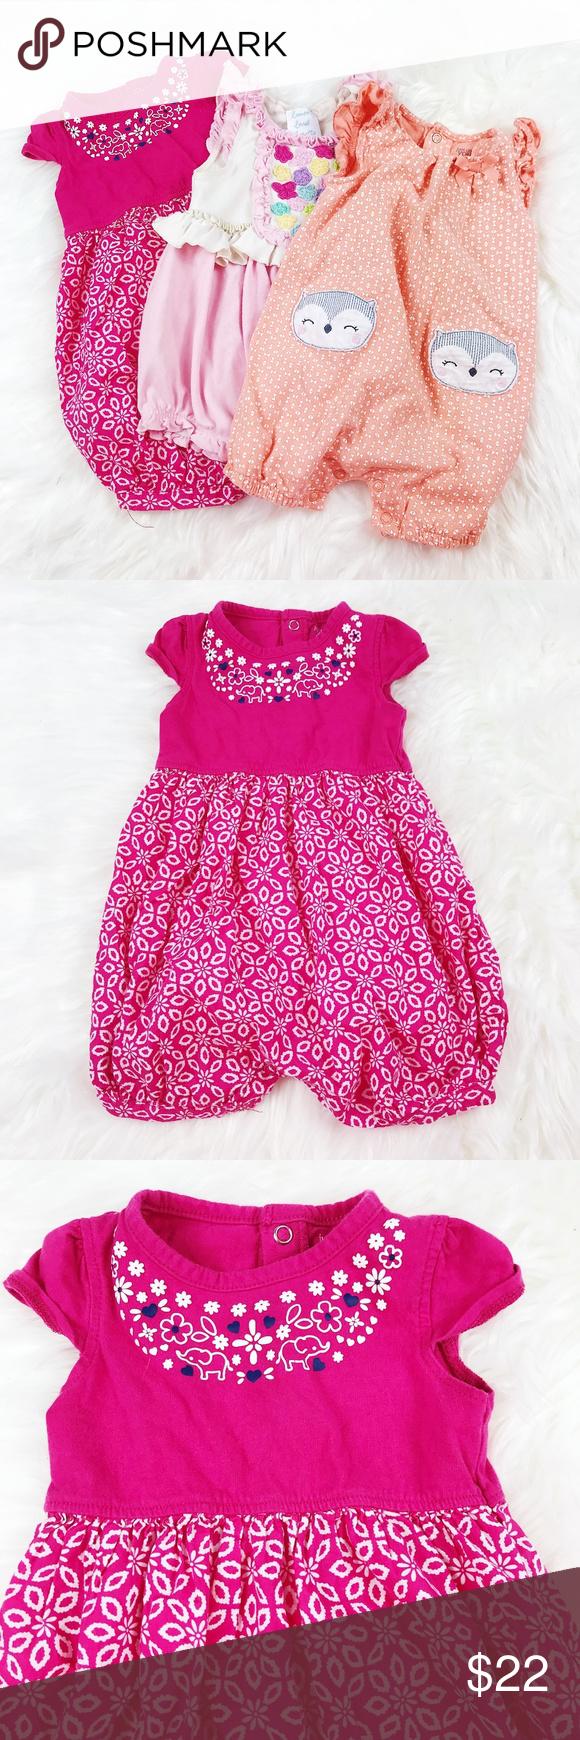 3efc8454b260  BABY GIRL  Lot of Rompers Simply Adorable Baby Girl Rompers! Pink   Orange